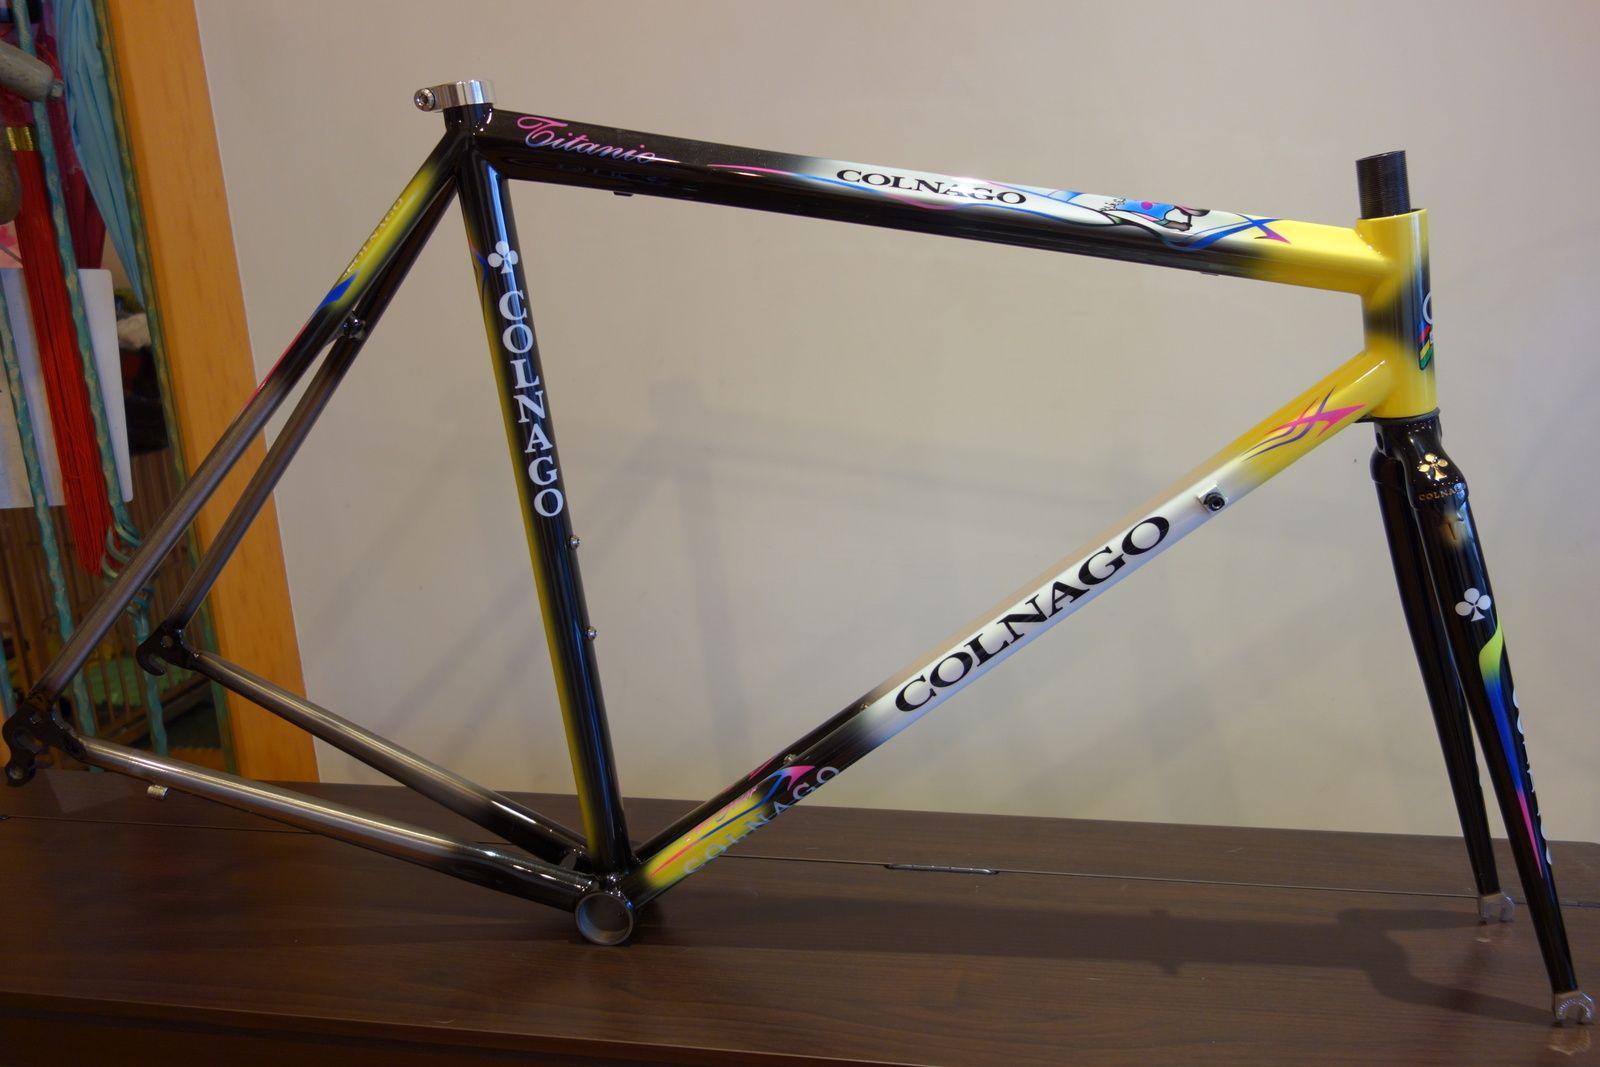 Colnago Titanio with steel fork, via The Paceline | bike | Pinterest